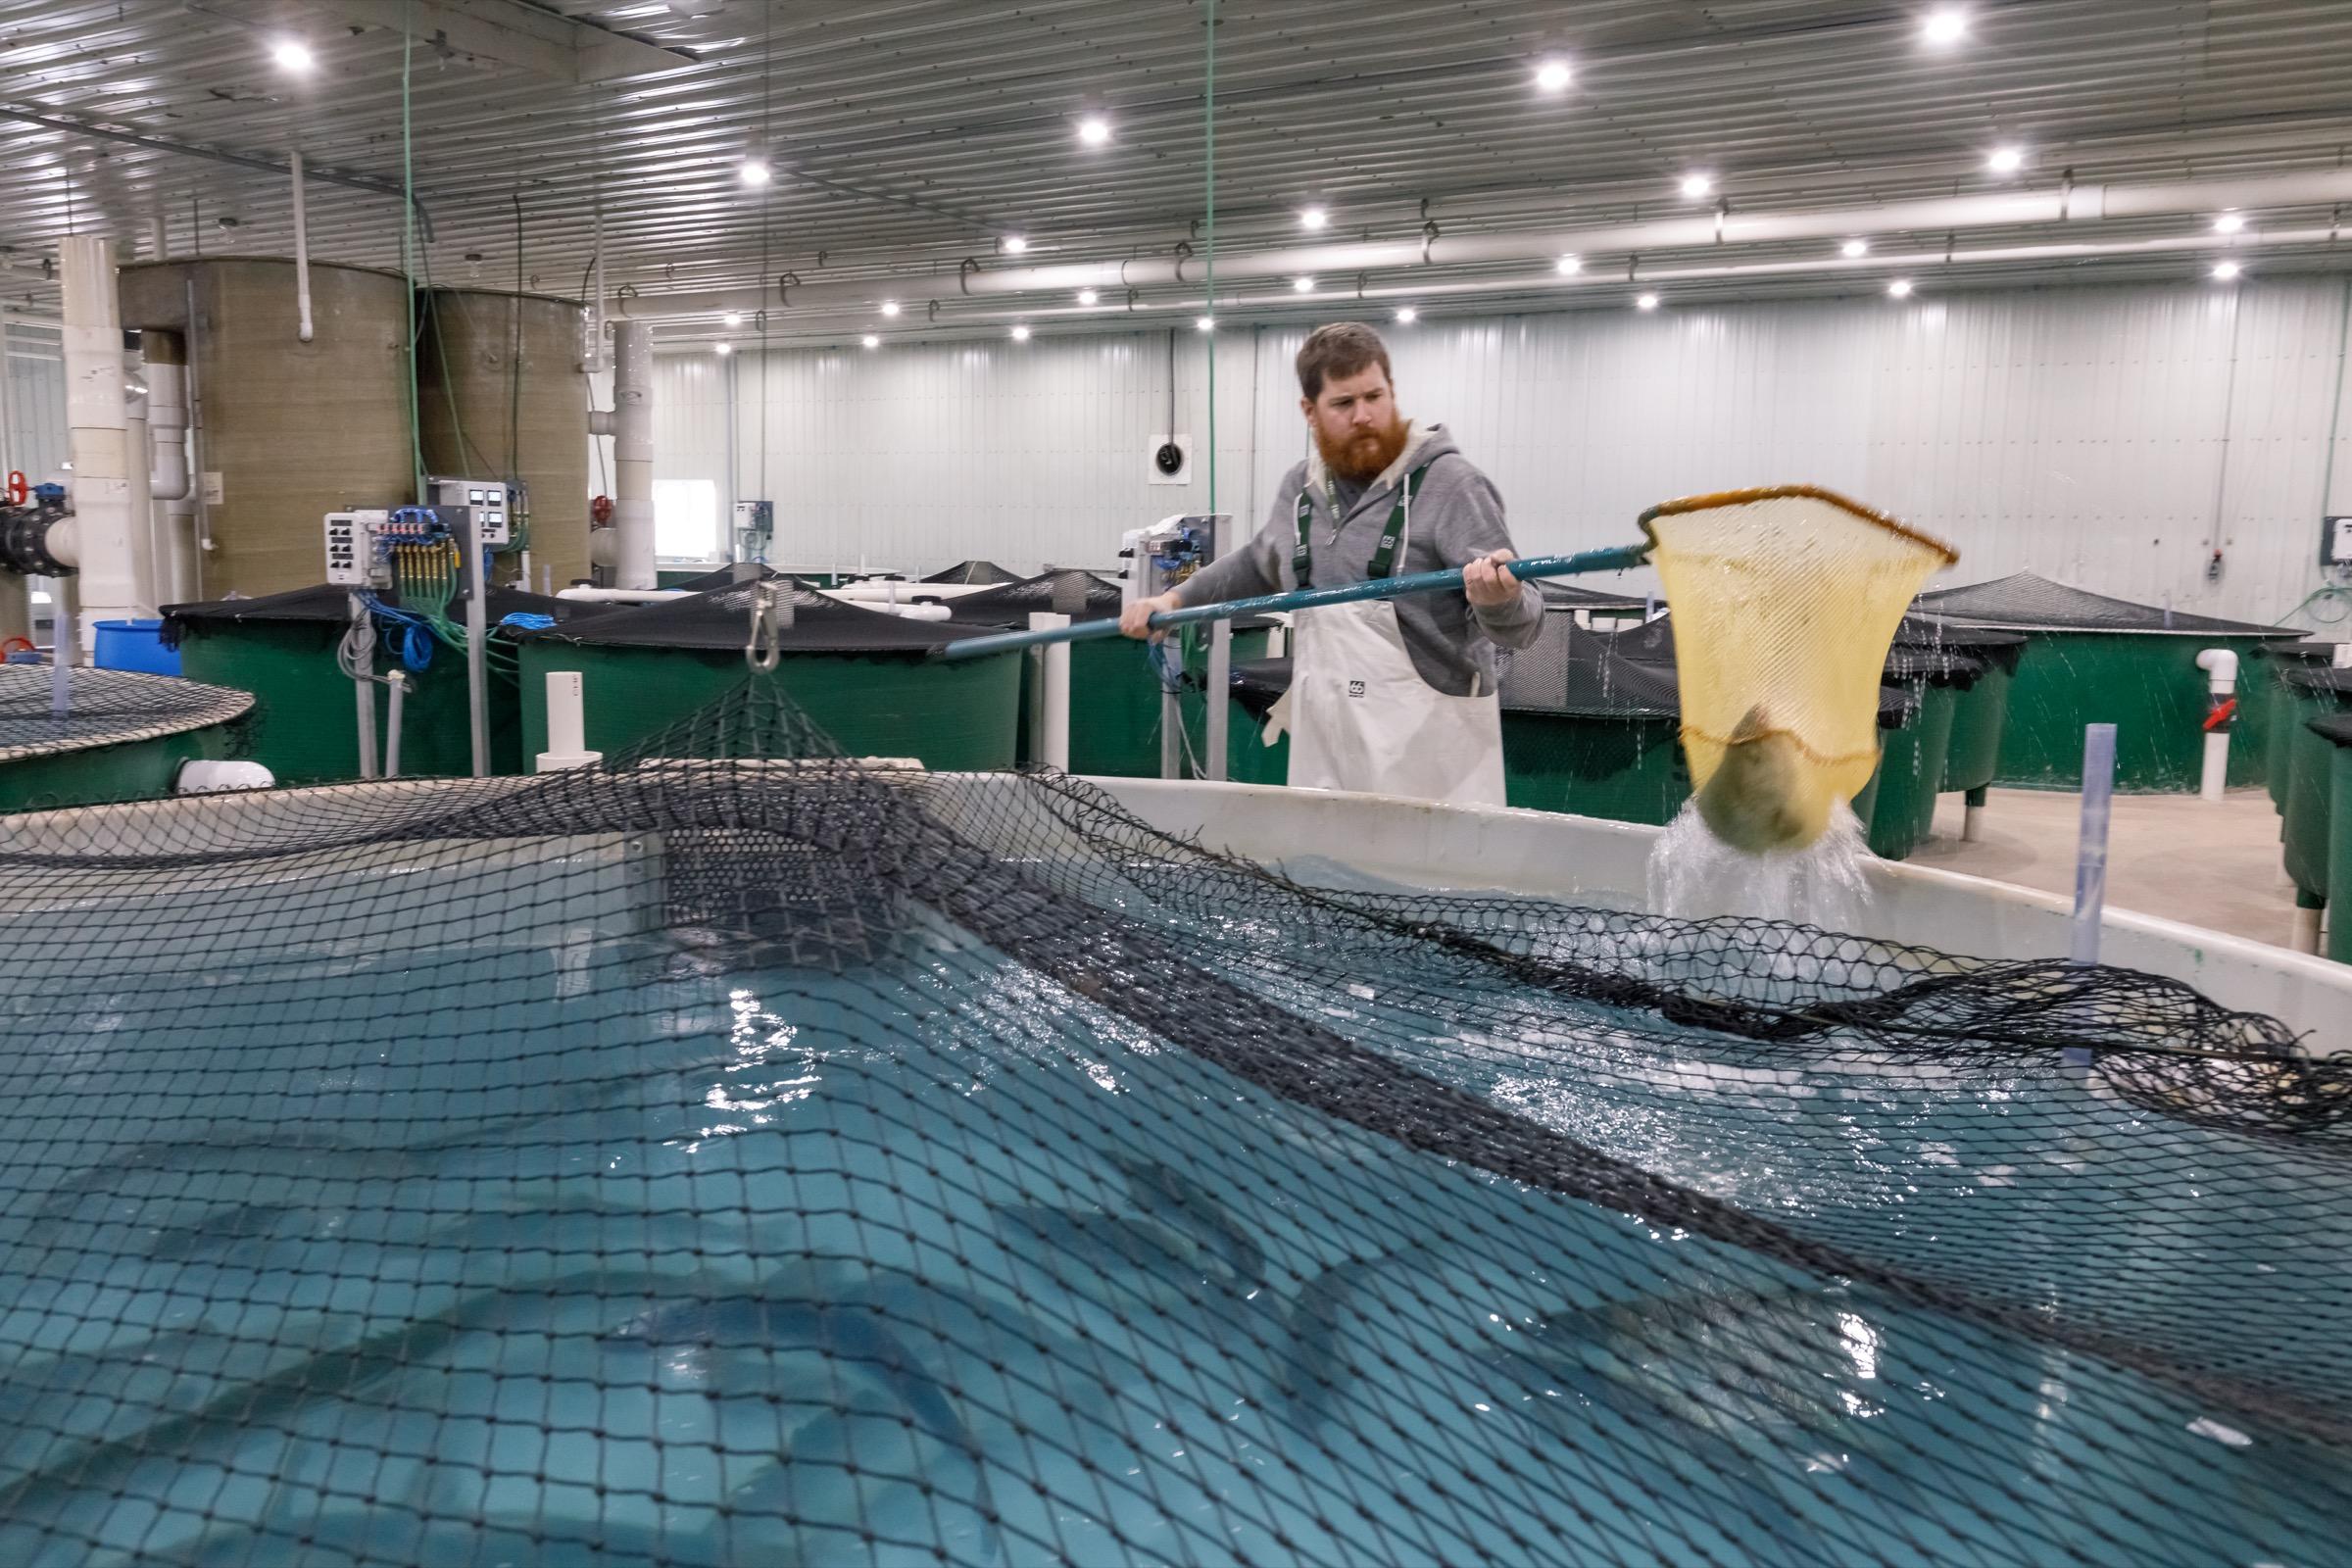 Facility manager Jon Veinot nets brood stock inside AquaBounty's new Rollo Bay hatchery. Photograph by Stephen DesRoches